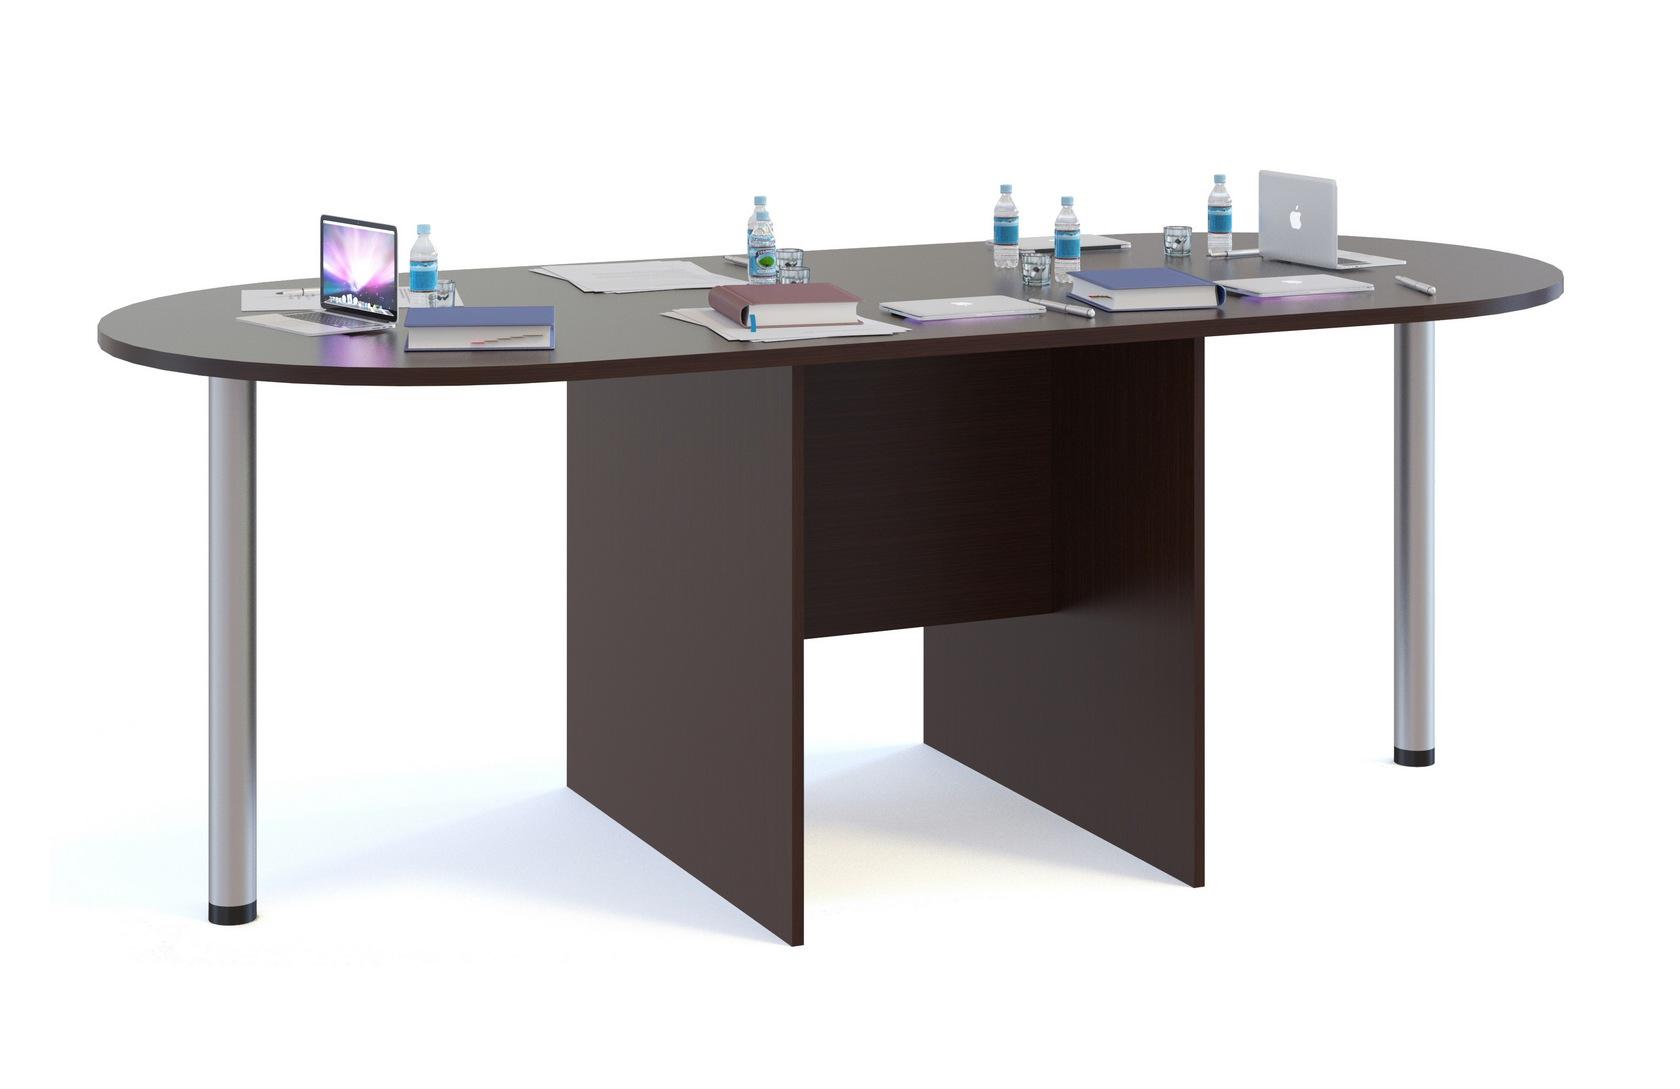 Стол для переговоров Сокол СПР-04+2 шт. СПР-03